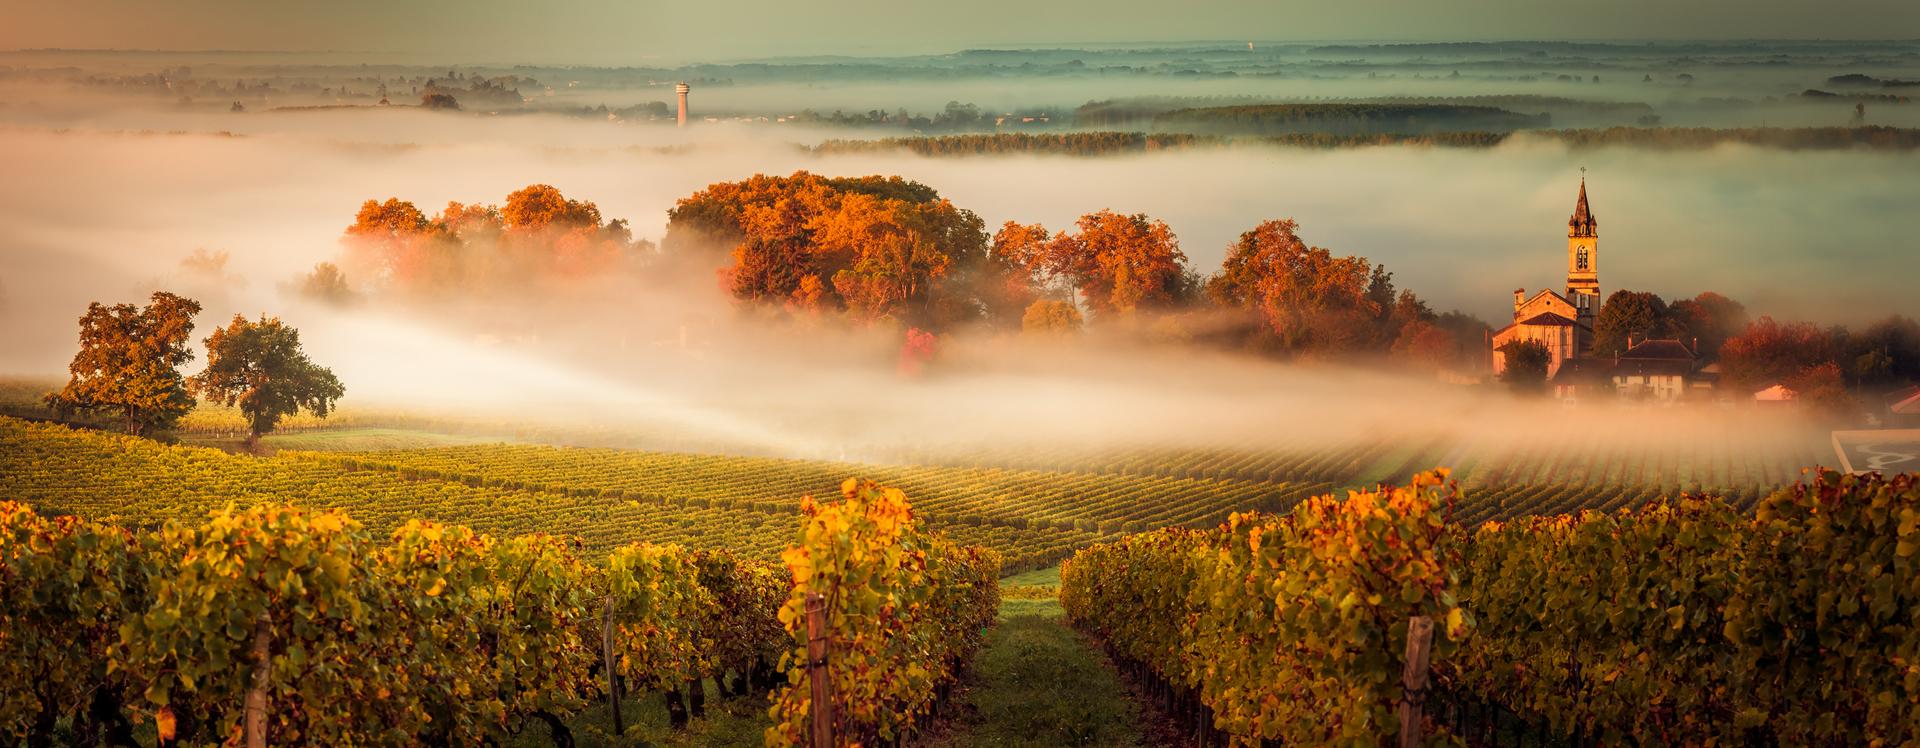 Bordeaux, France esperanza33-istock